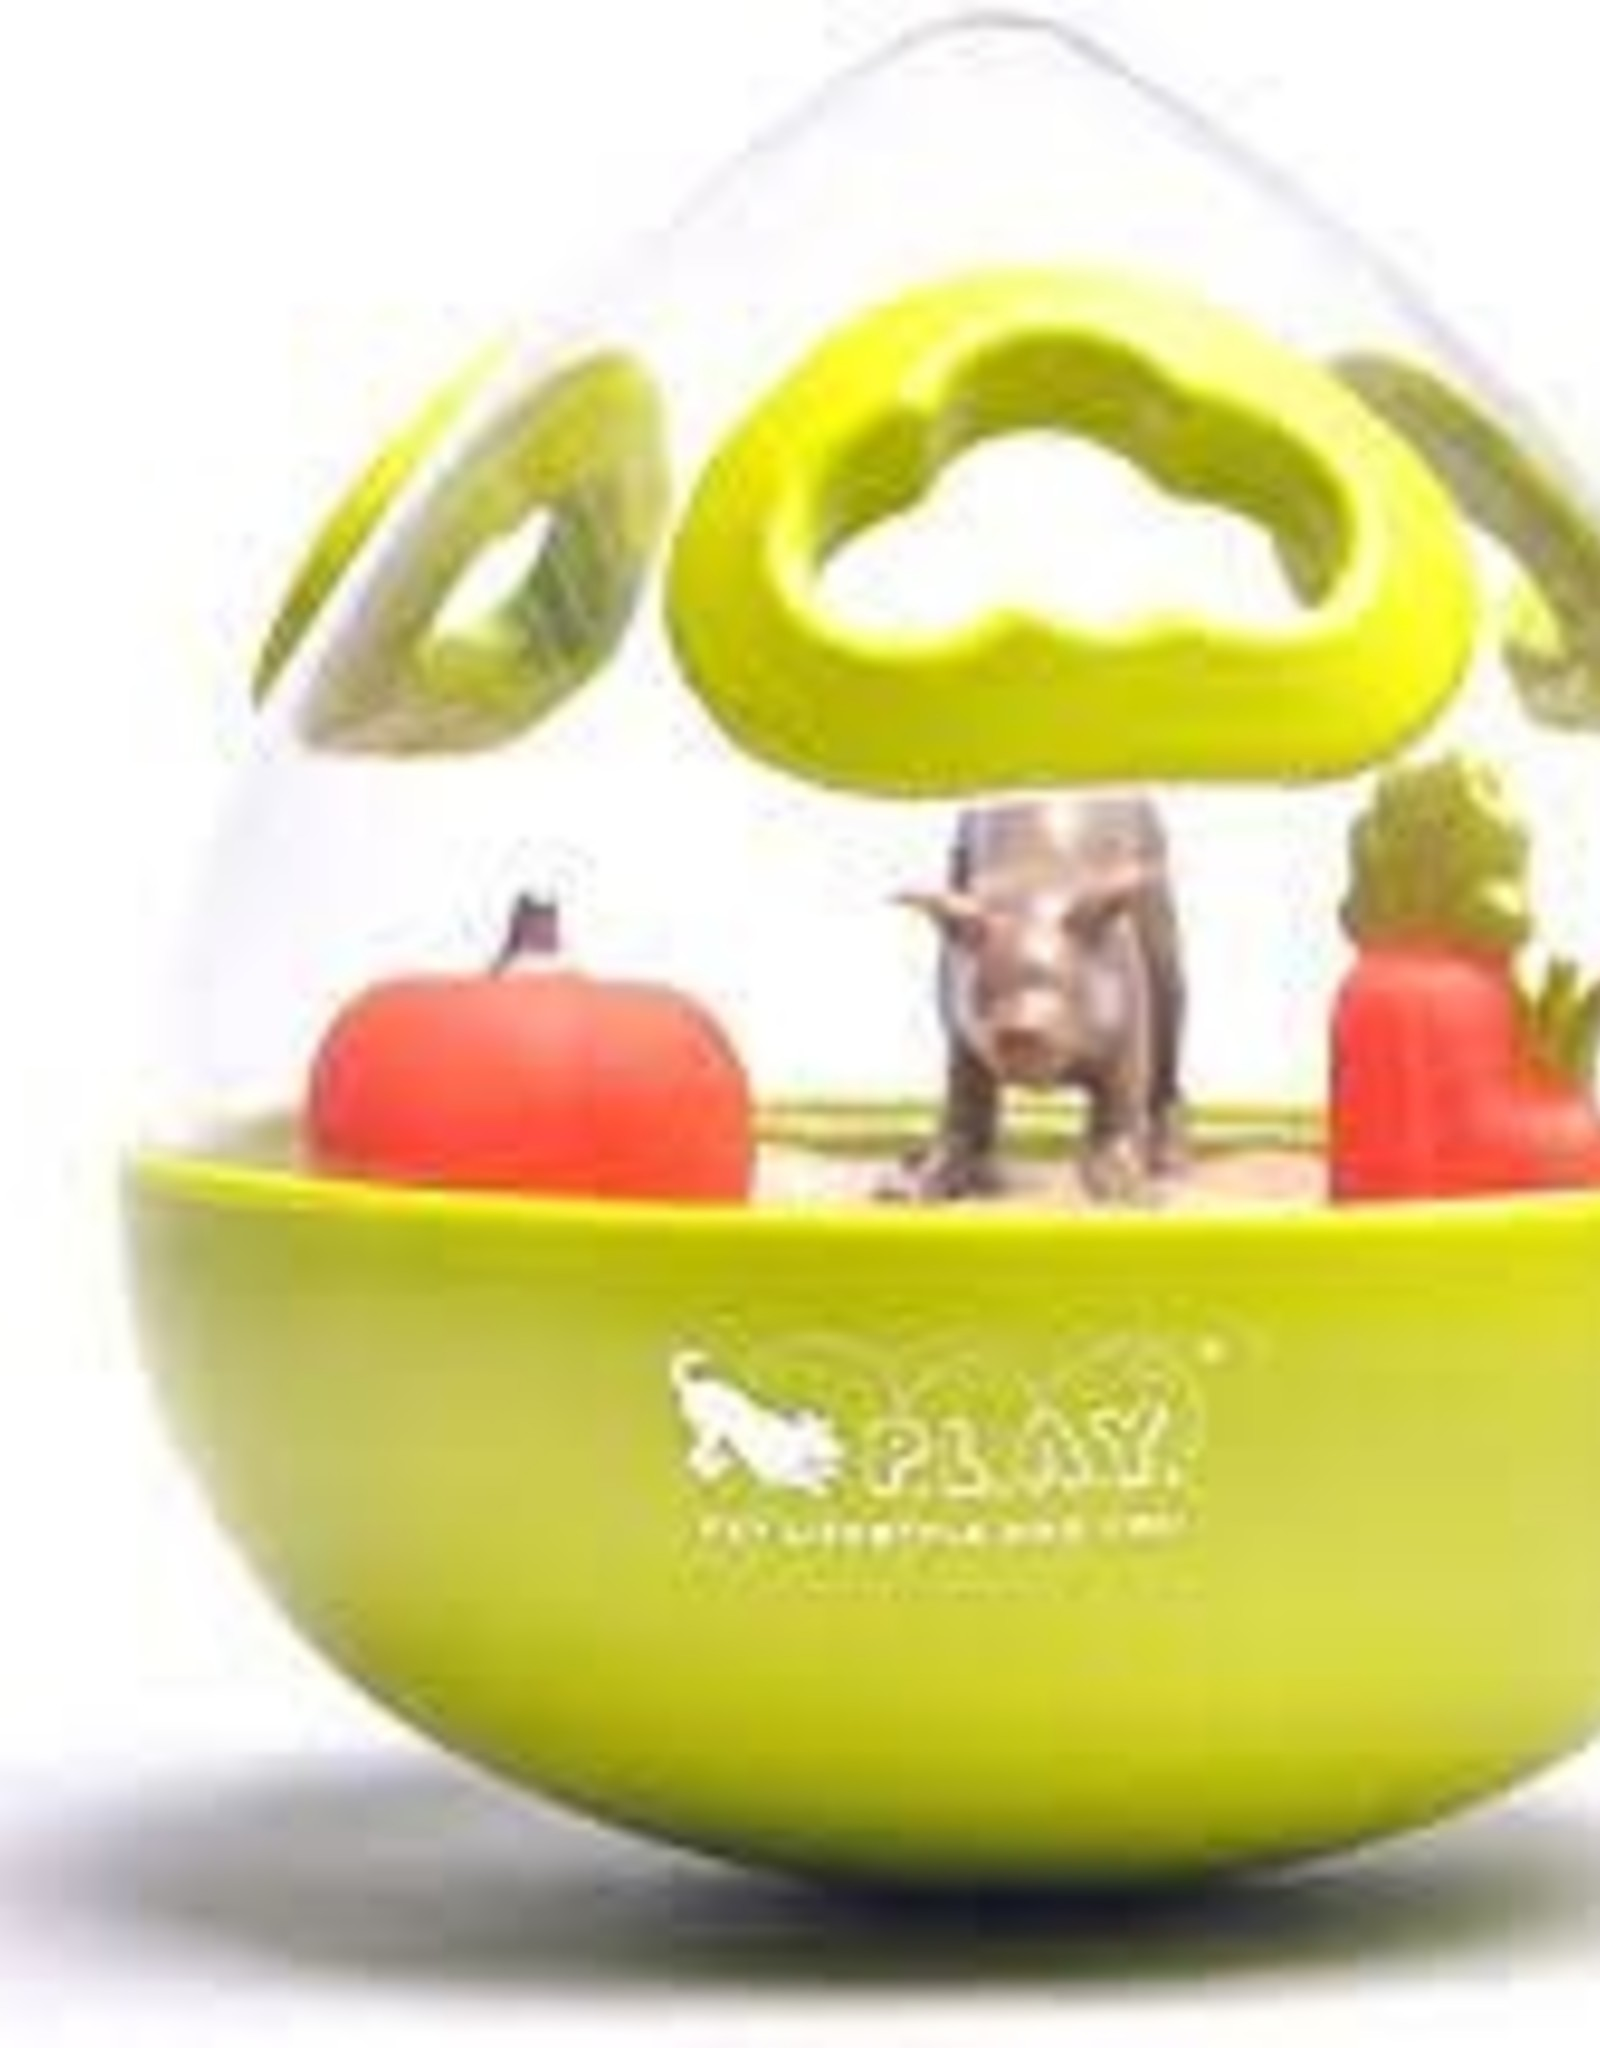 Pet Play Pet Play Wobble Ball 2.0 Enrichment Treat Toy Green